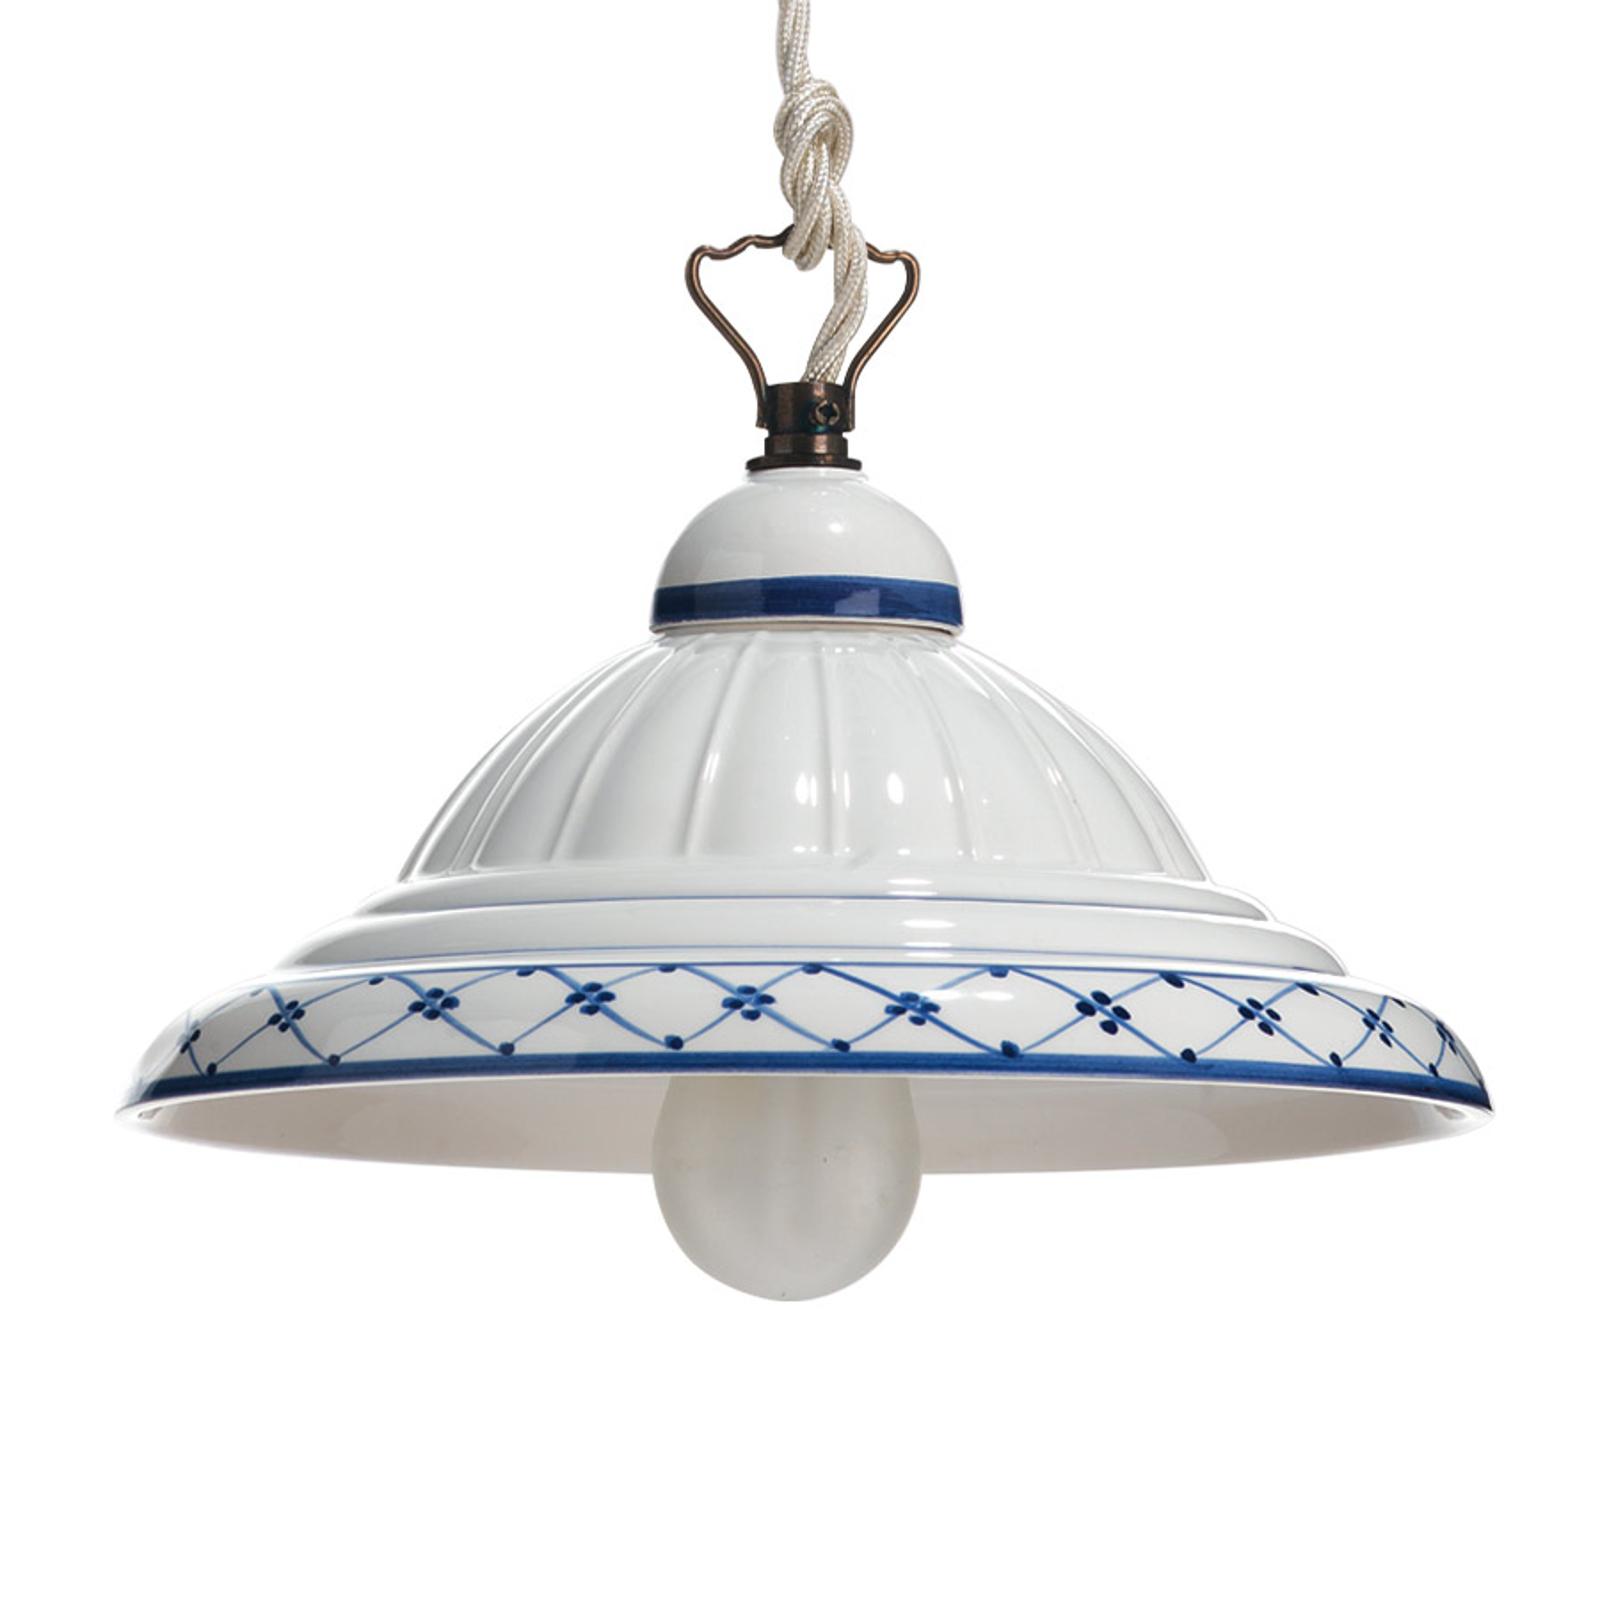 Keramická závesná lampa Firenze vidiecky štýl